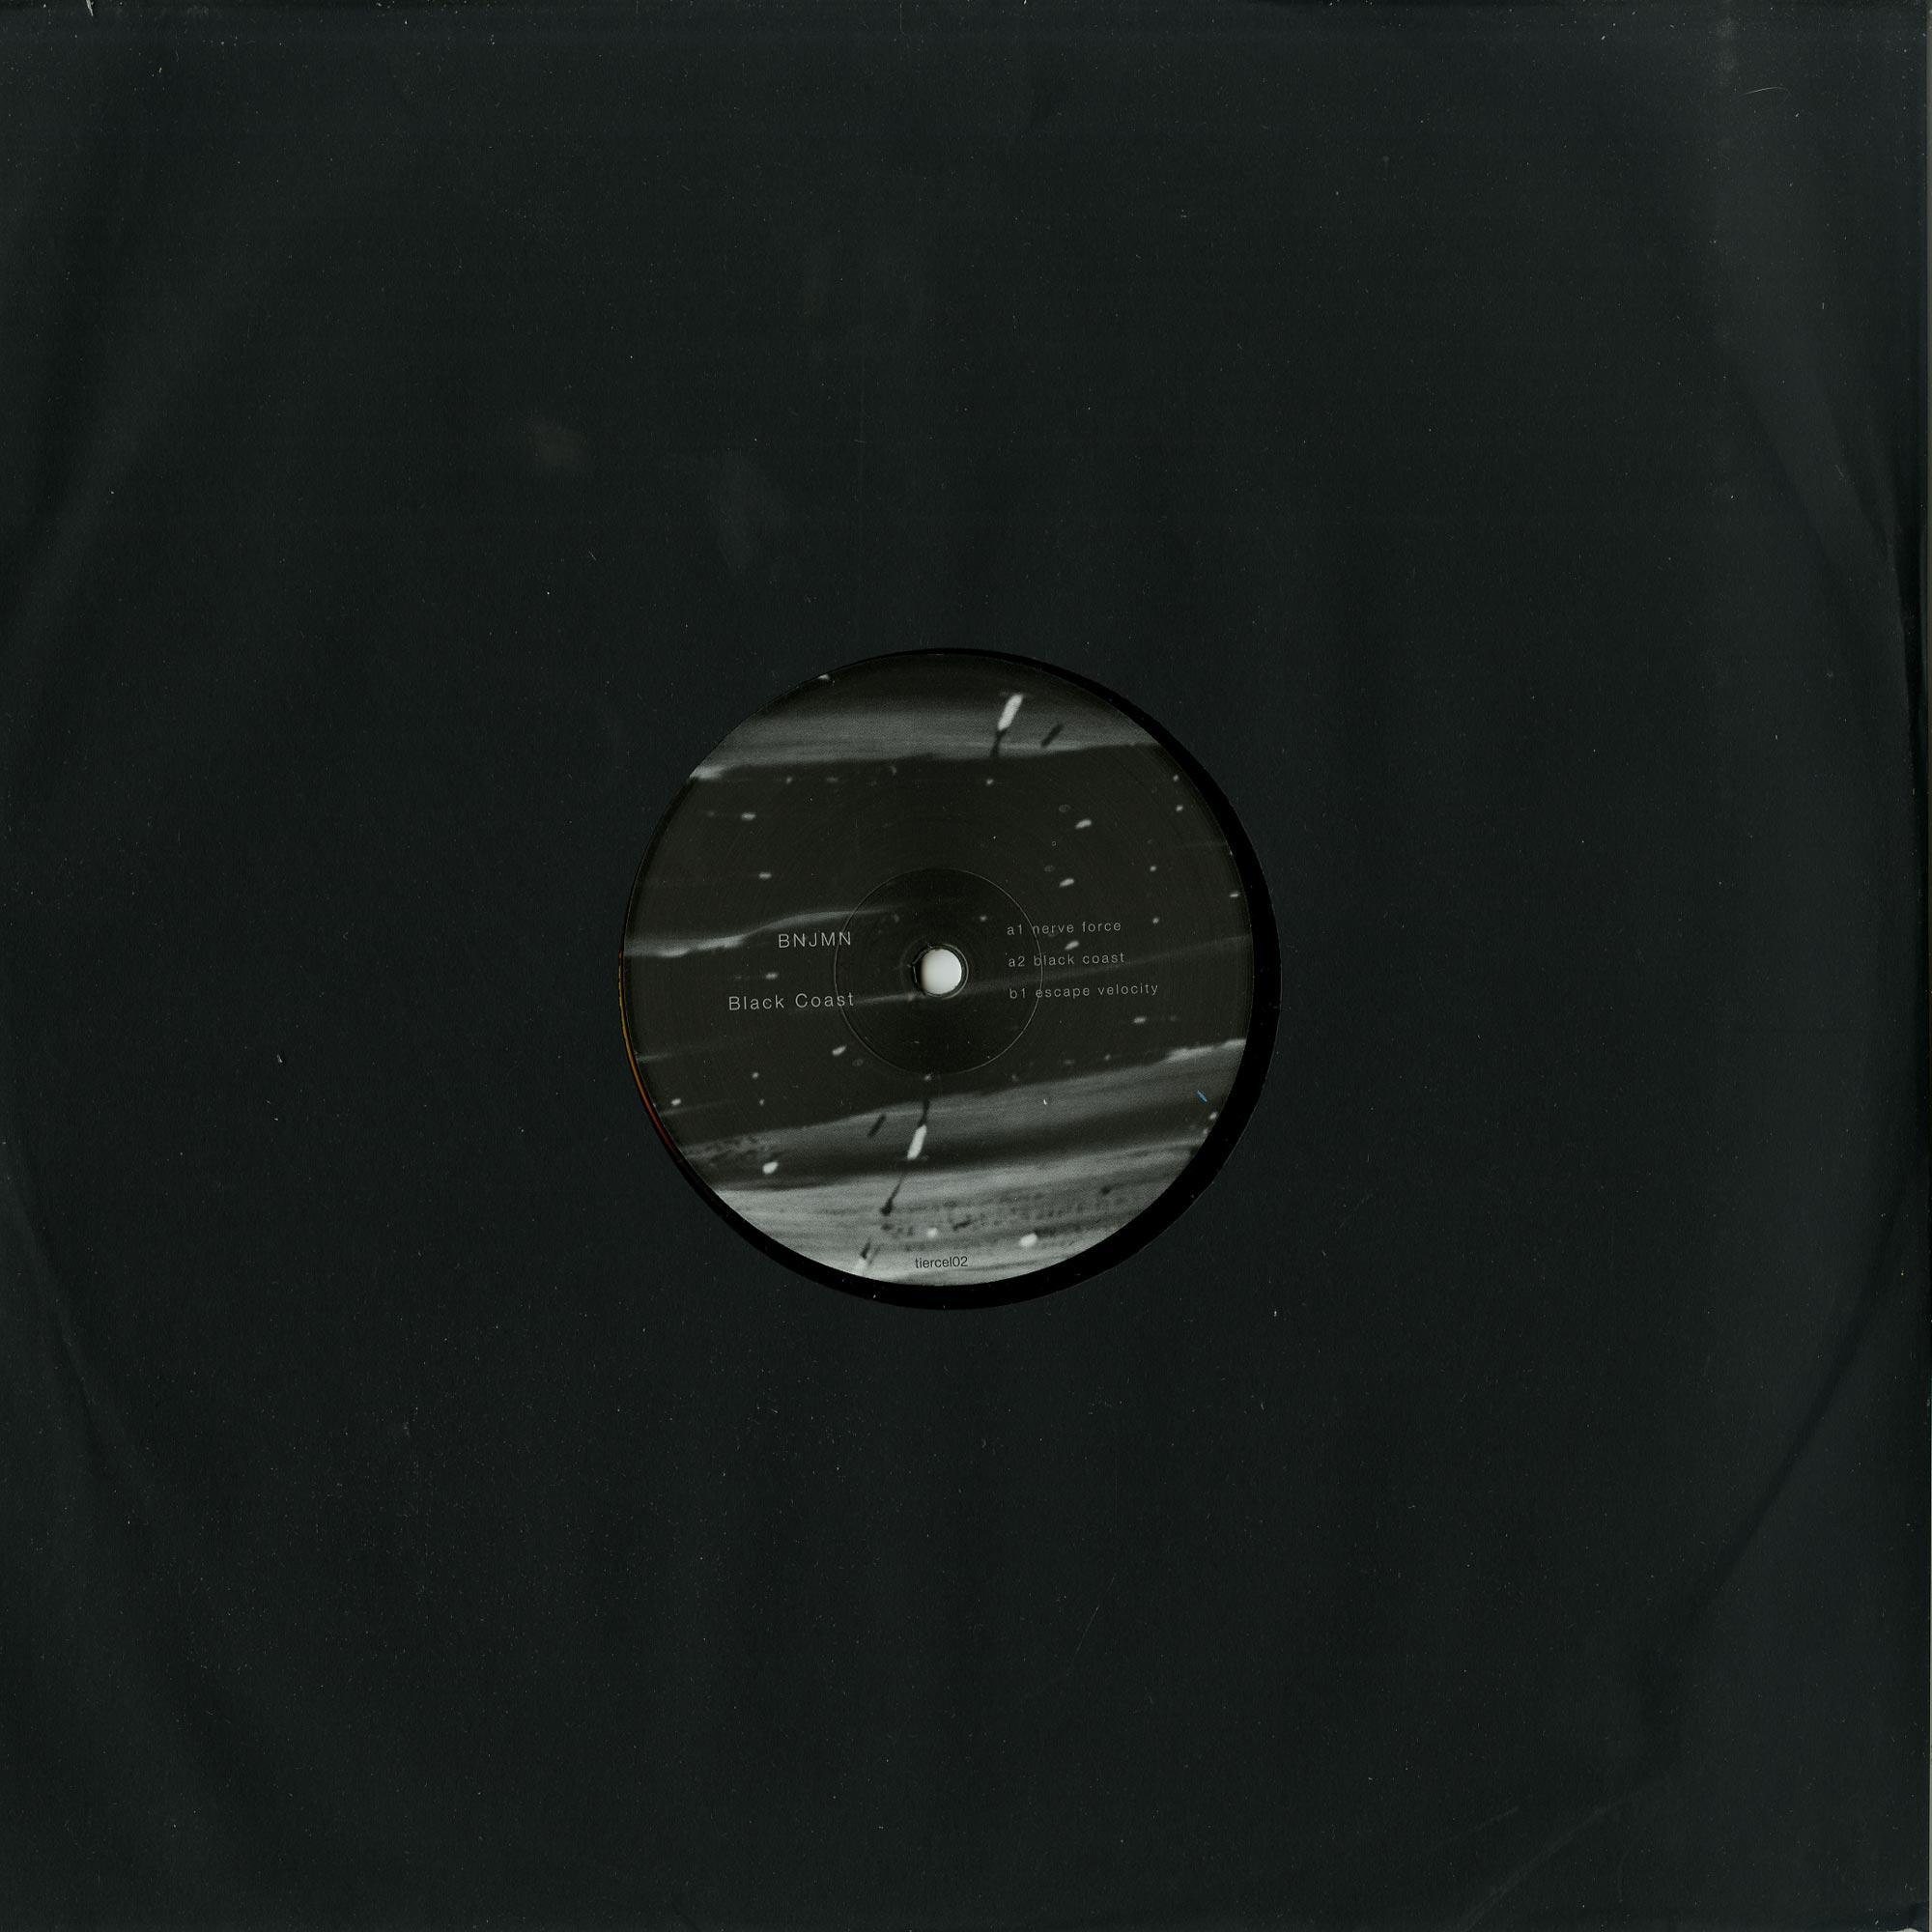 Bnjmn - BLACK COAST EP